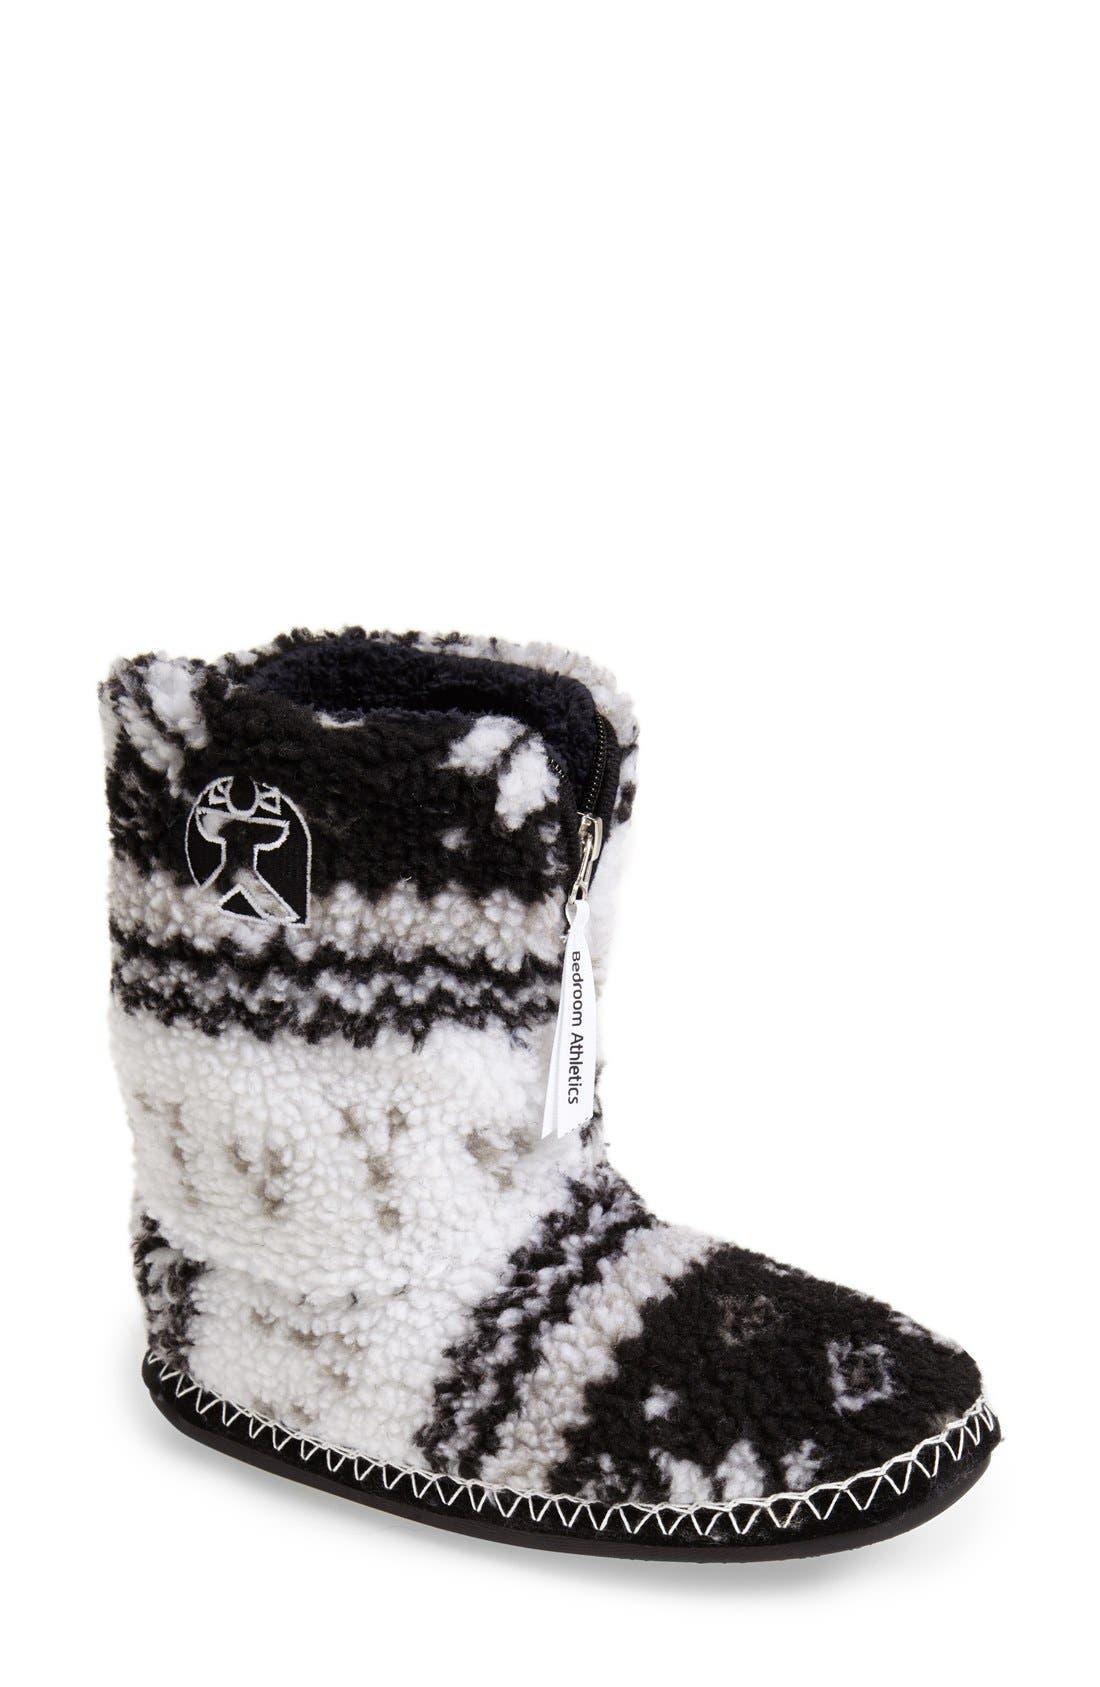 'Jessica' Slipper Boot,                             Main thumbnail 1, color,                             009